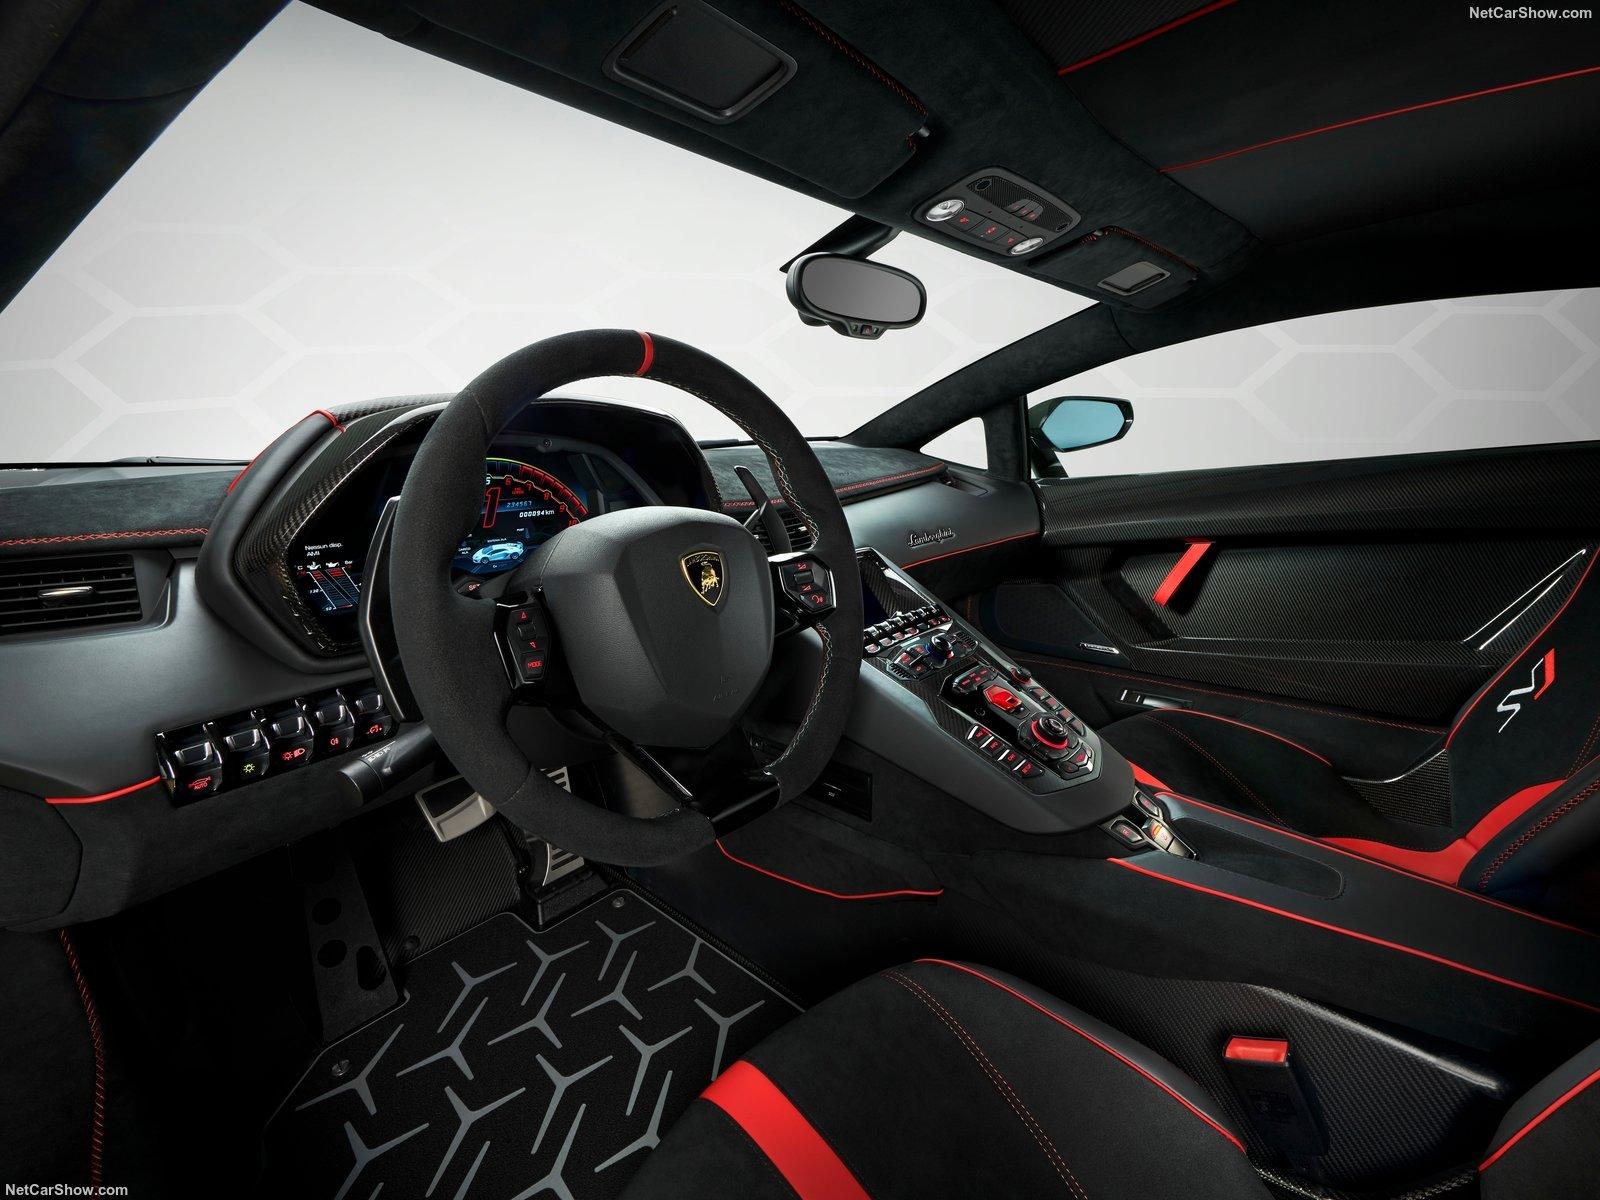 2019 Lamborghini Aventador Svj Revealed Fire Breathing